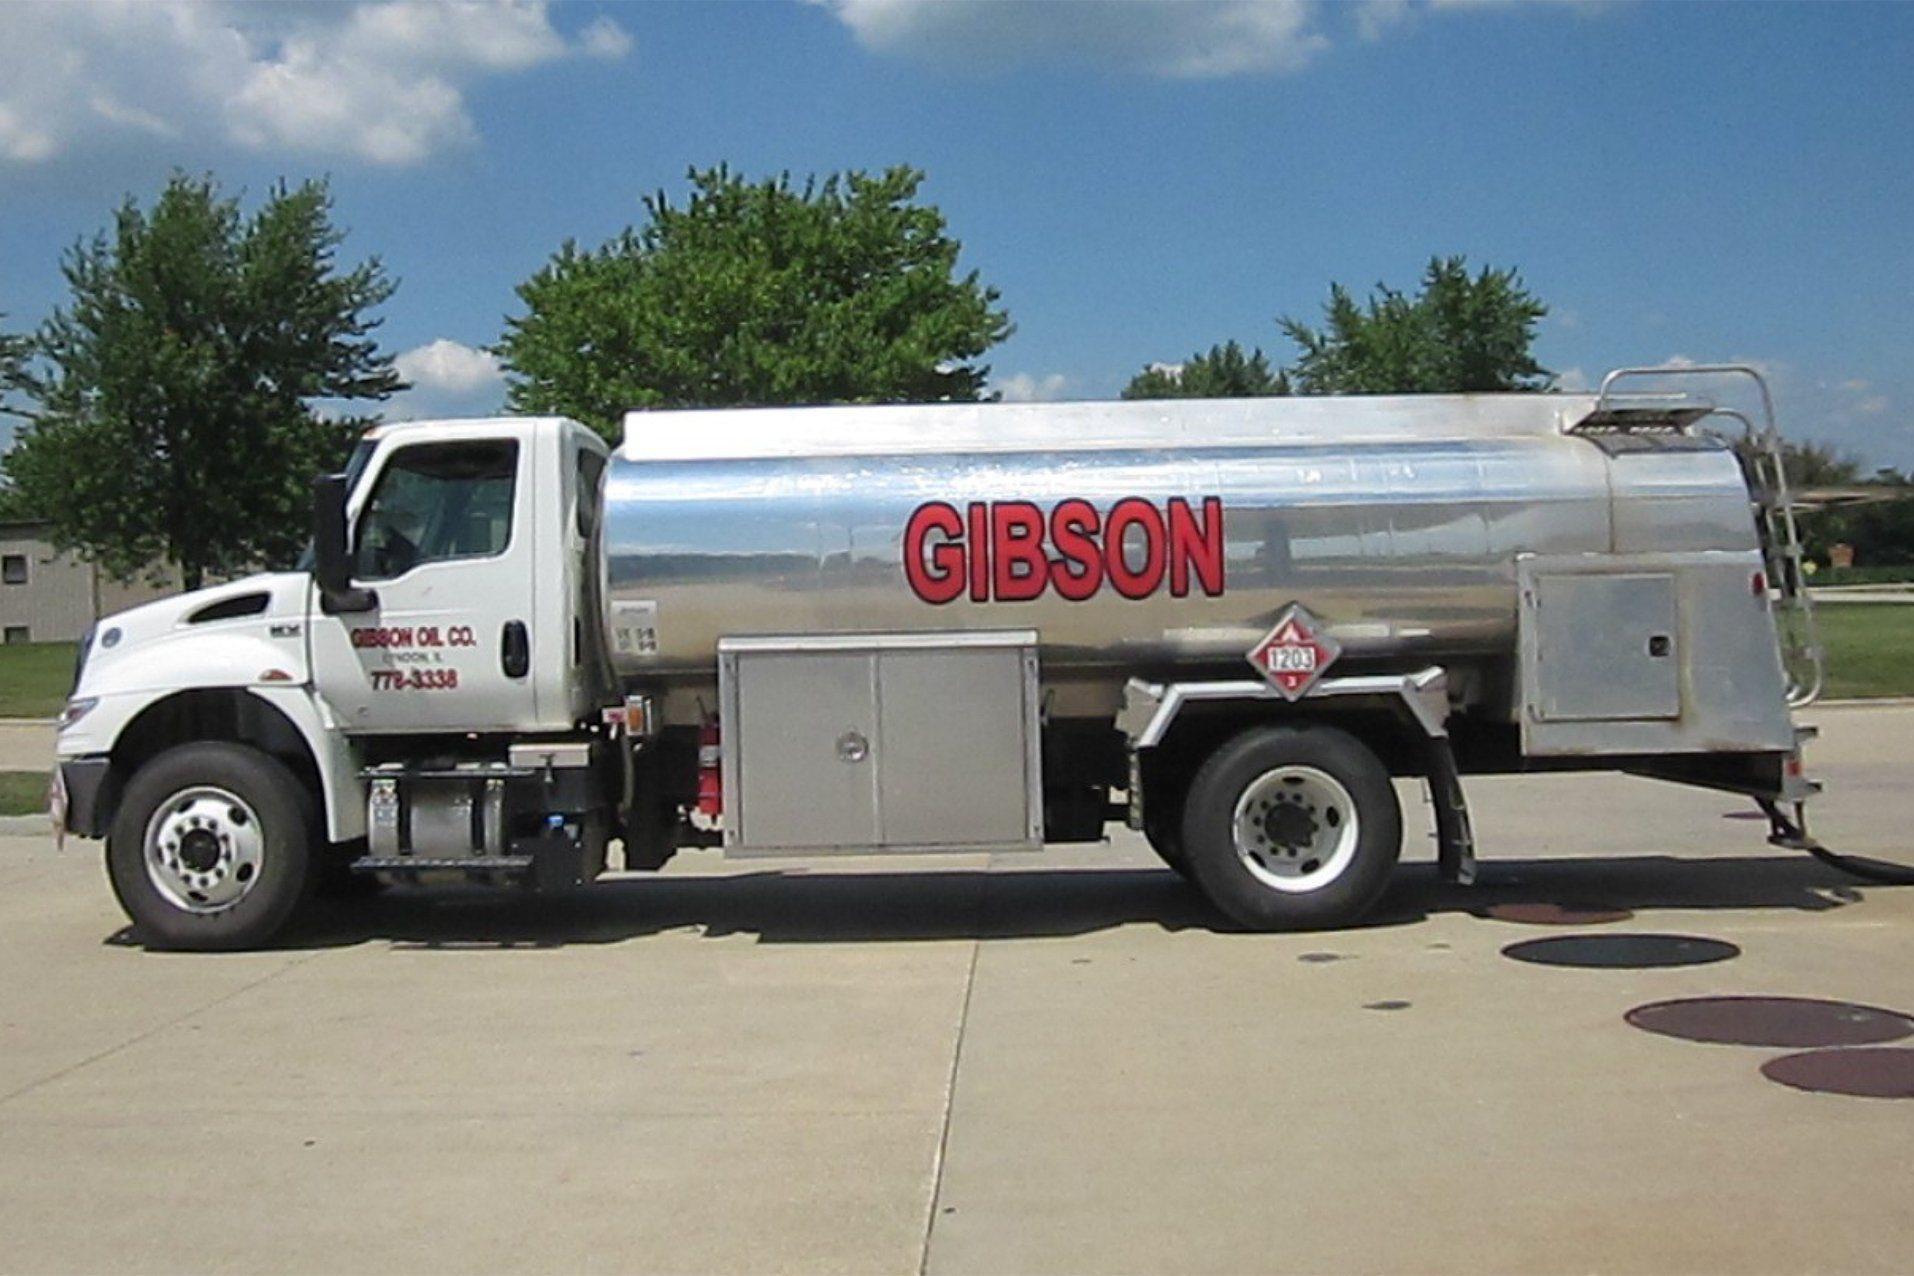 Gibson's Oil Company